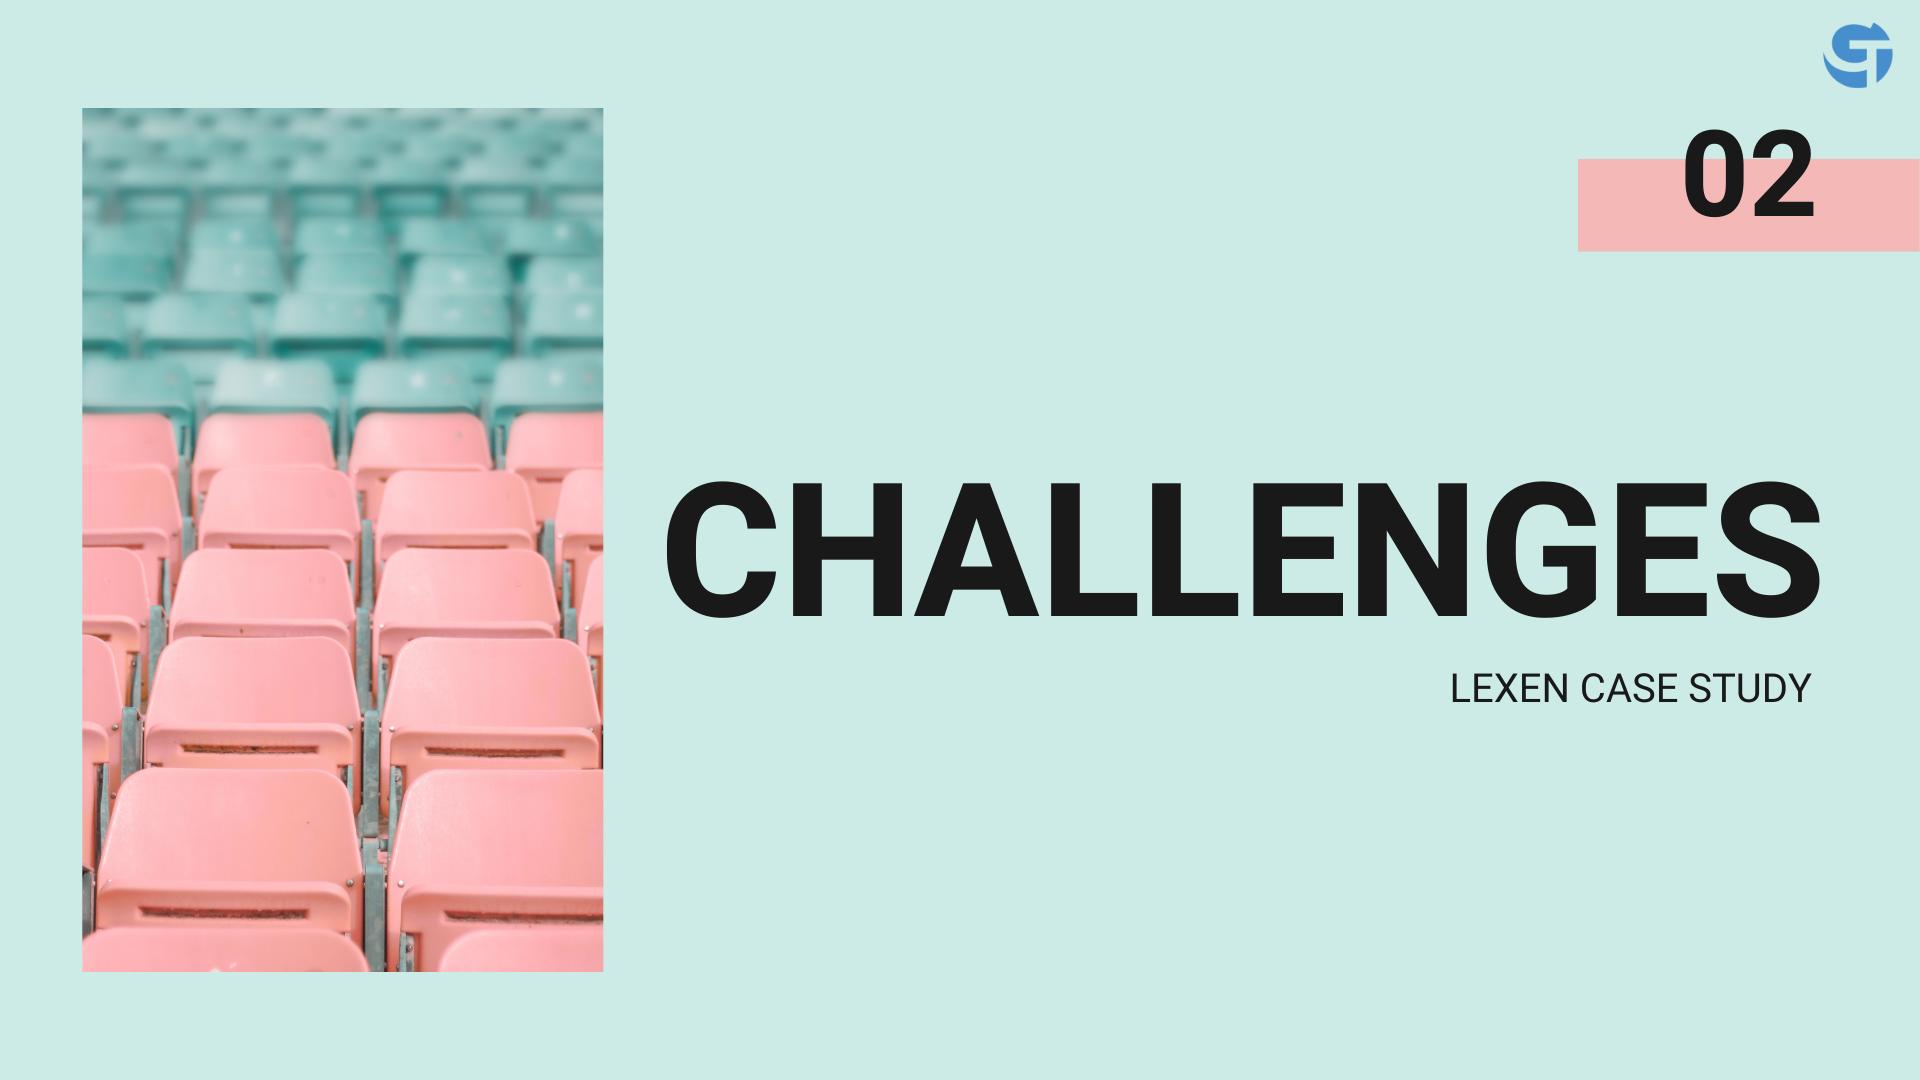 How Lexen Hotel was facing challenges